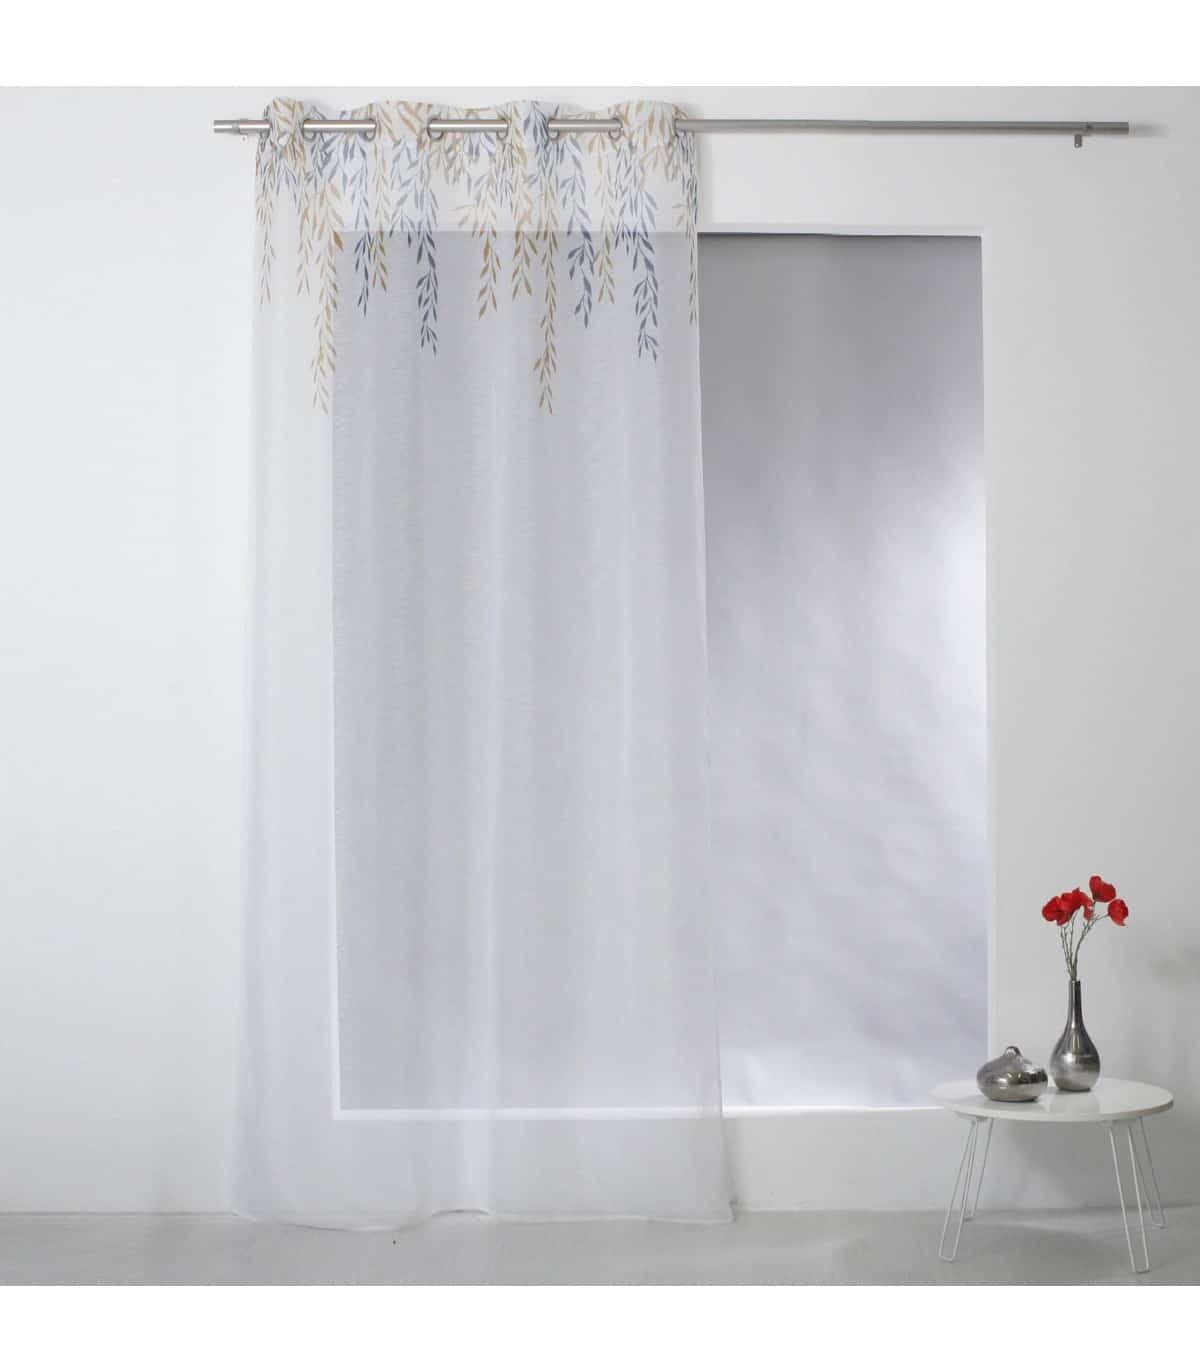 voilage blanc motif feuille stylise moderne